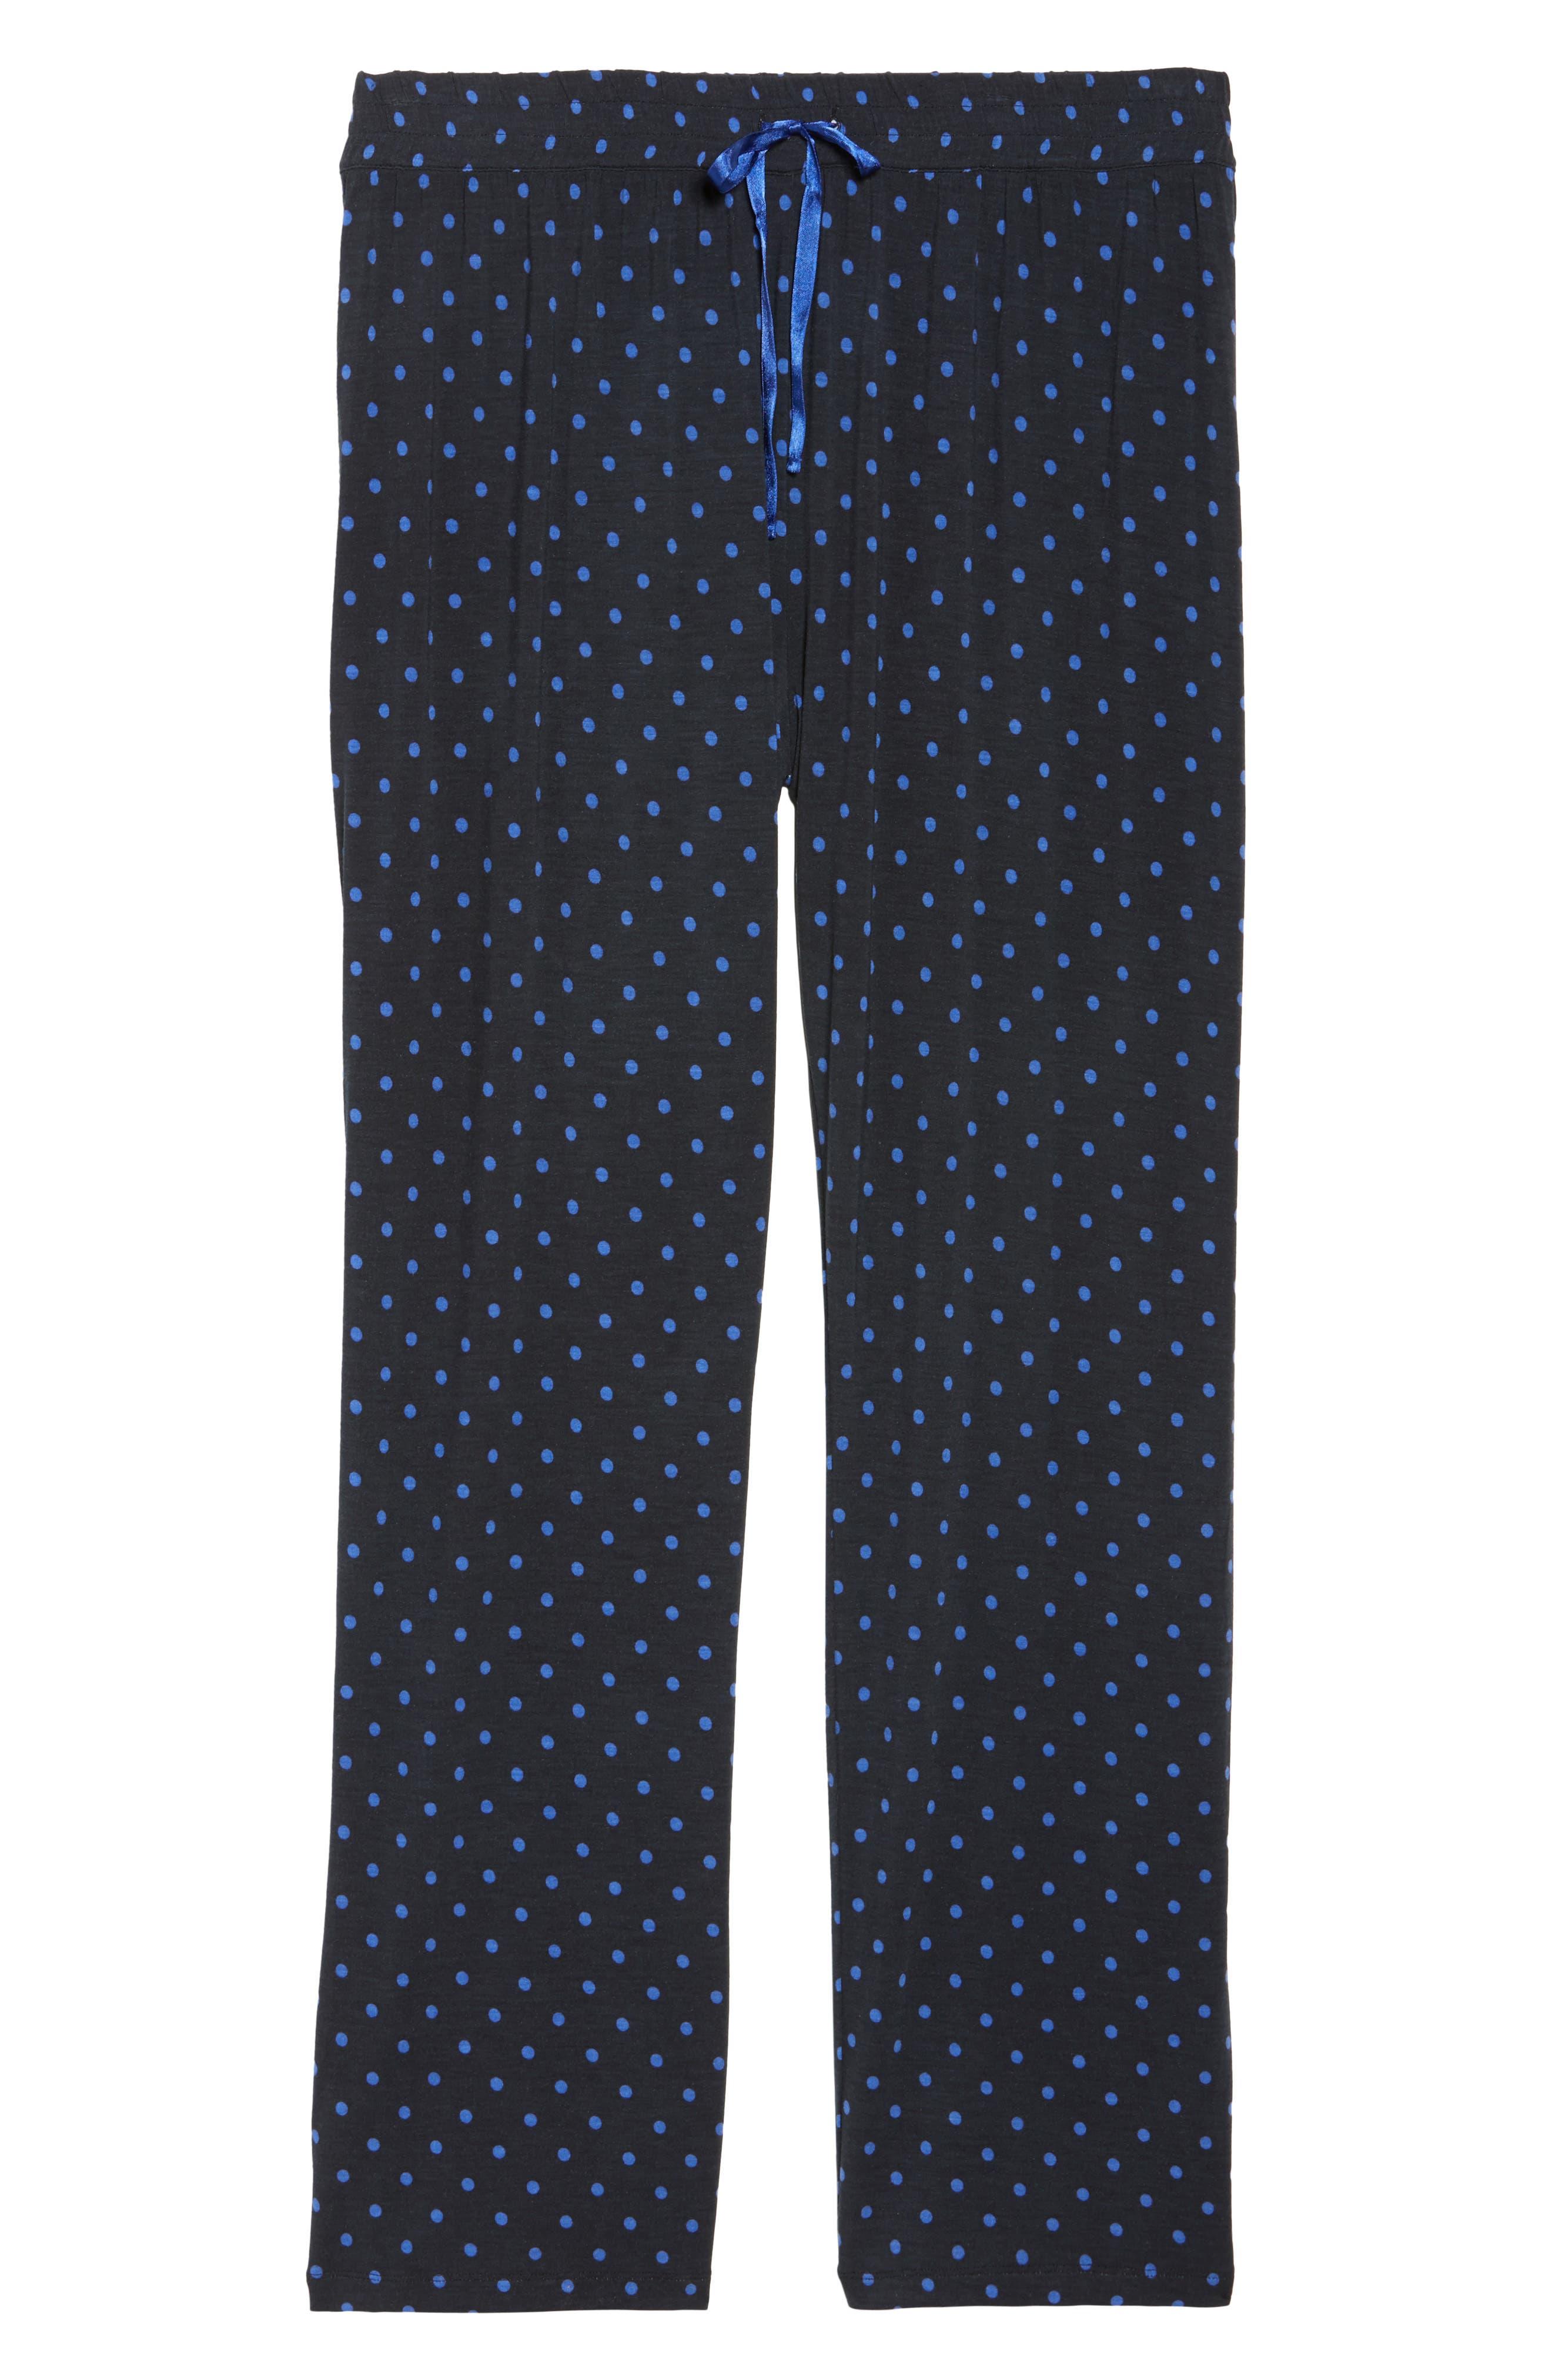 Dot Lounge Pants,                             Alternate thumbnail 4, color,                             Black